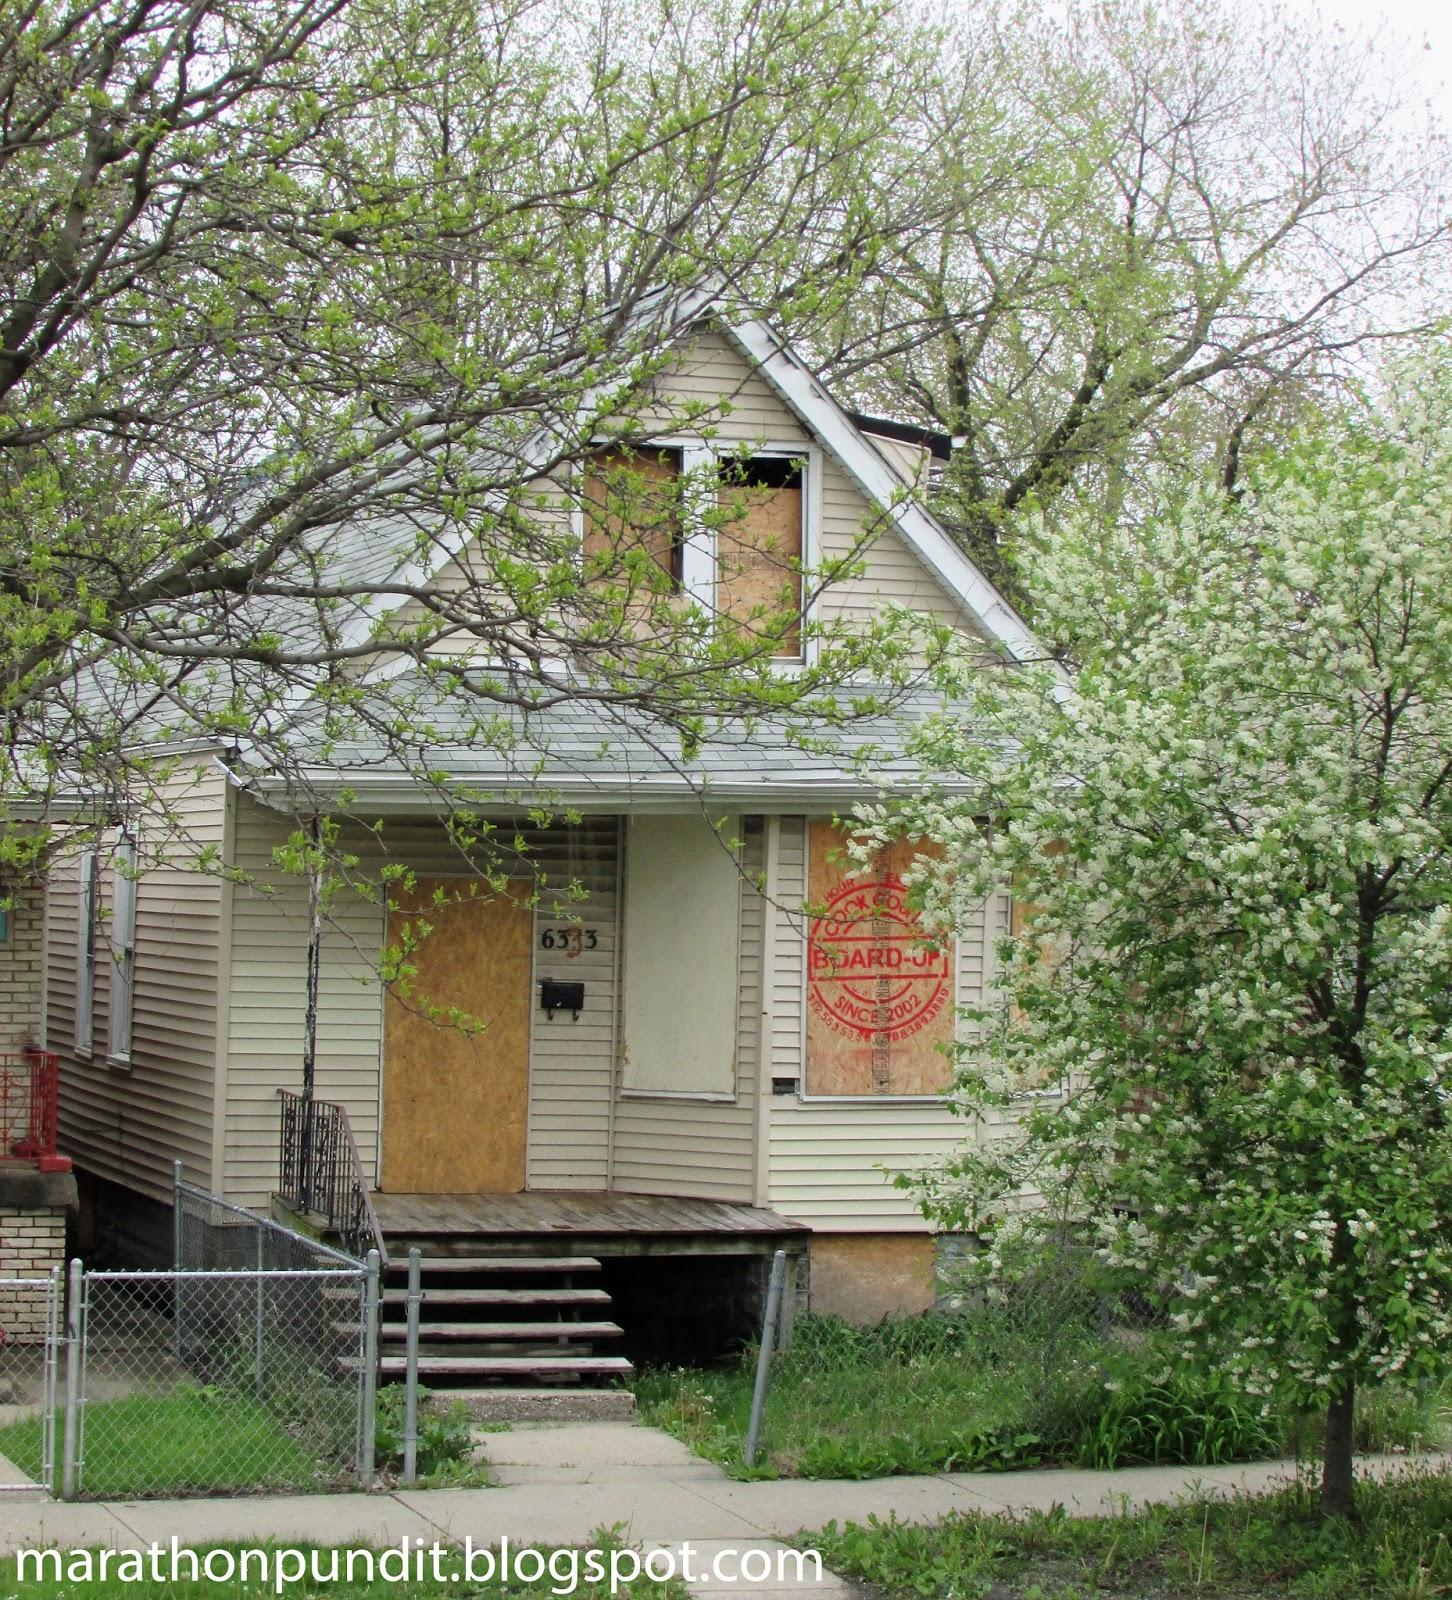 Marathon Pundit: (Photos) The Abandoned Homes Of Chicago's